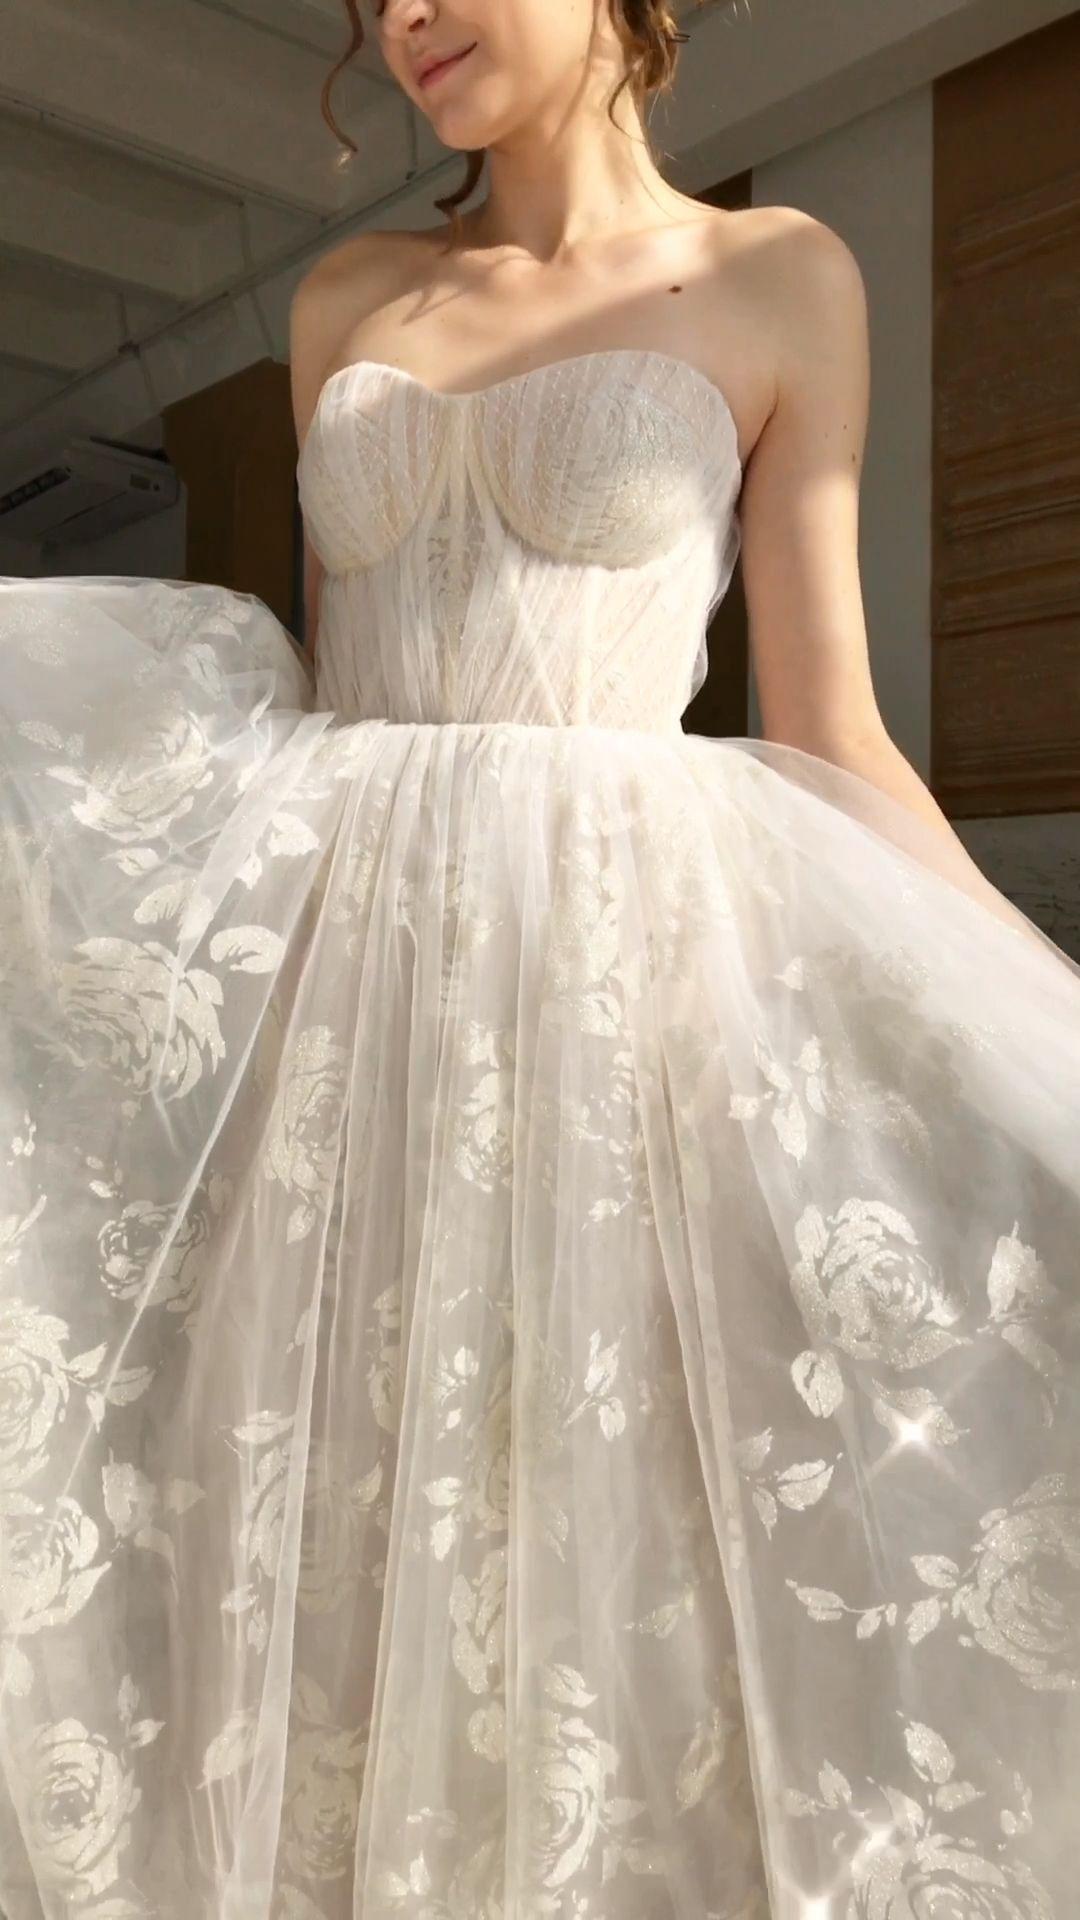 Robe de mariée scintillante scintillante avec roses   – One day